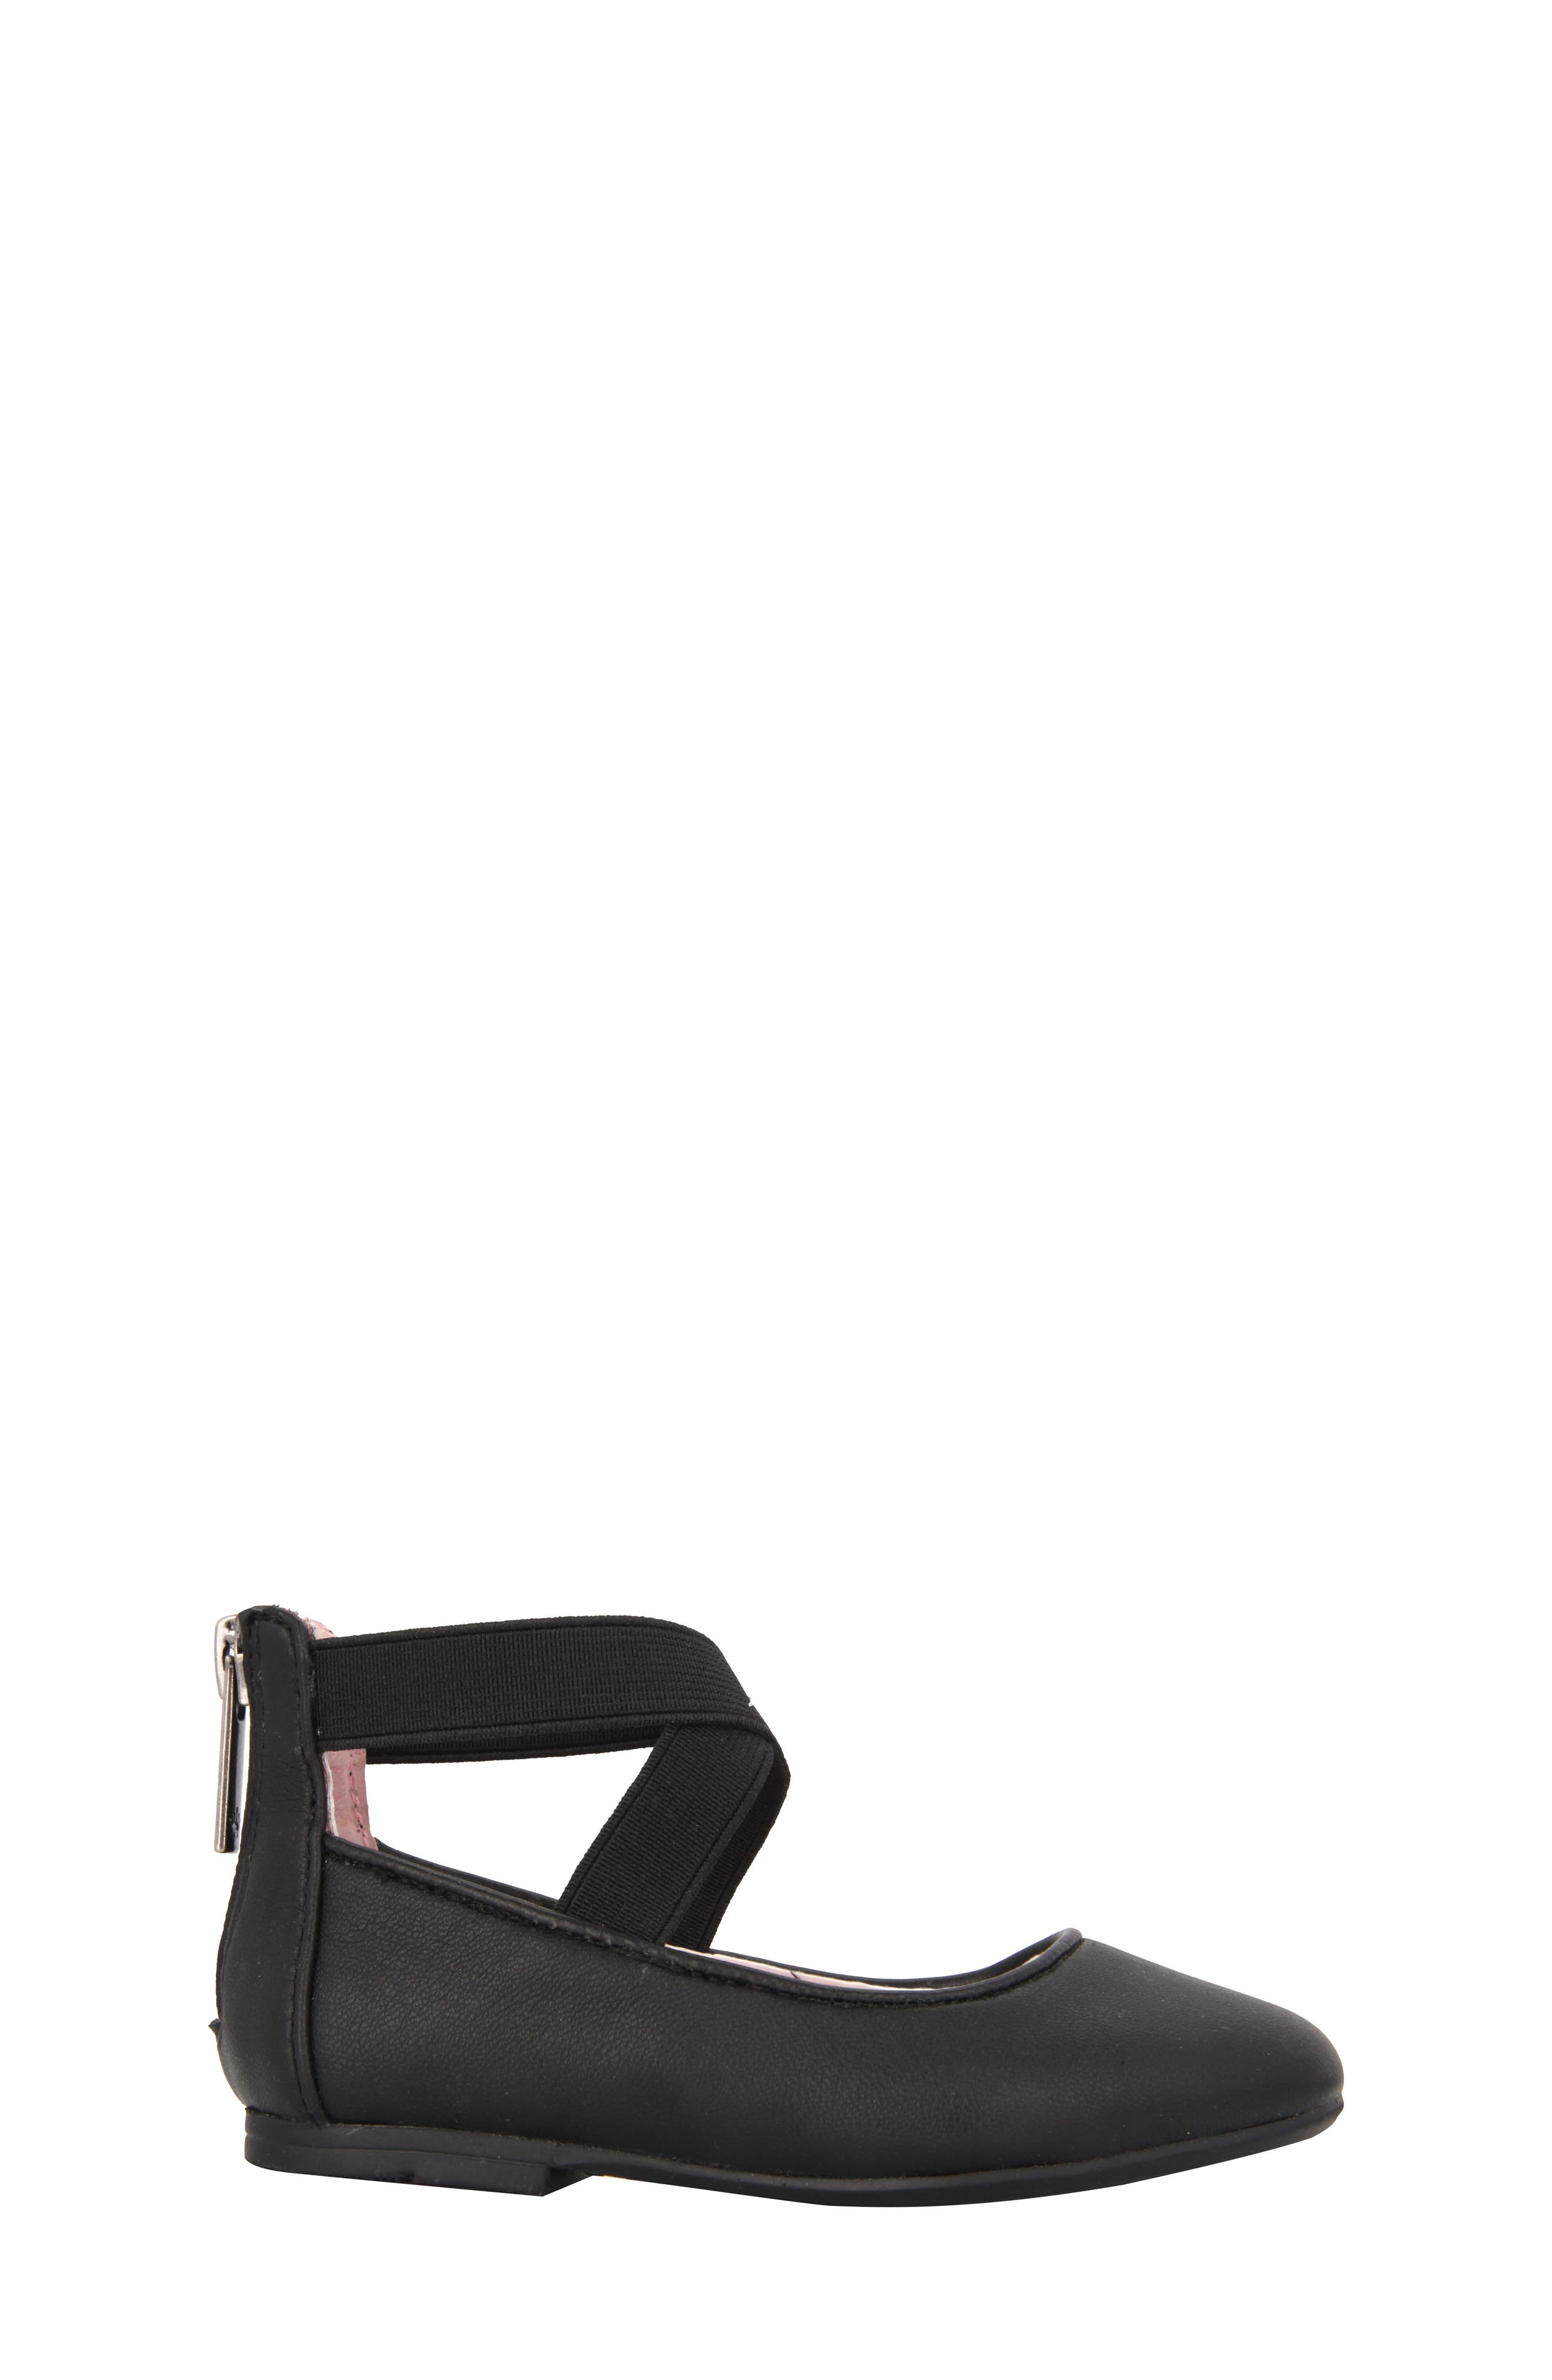 Marissa Cross Strap Flat,                             Alternate thumbnail 3, color,                             Black Faux Leather